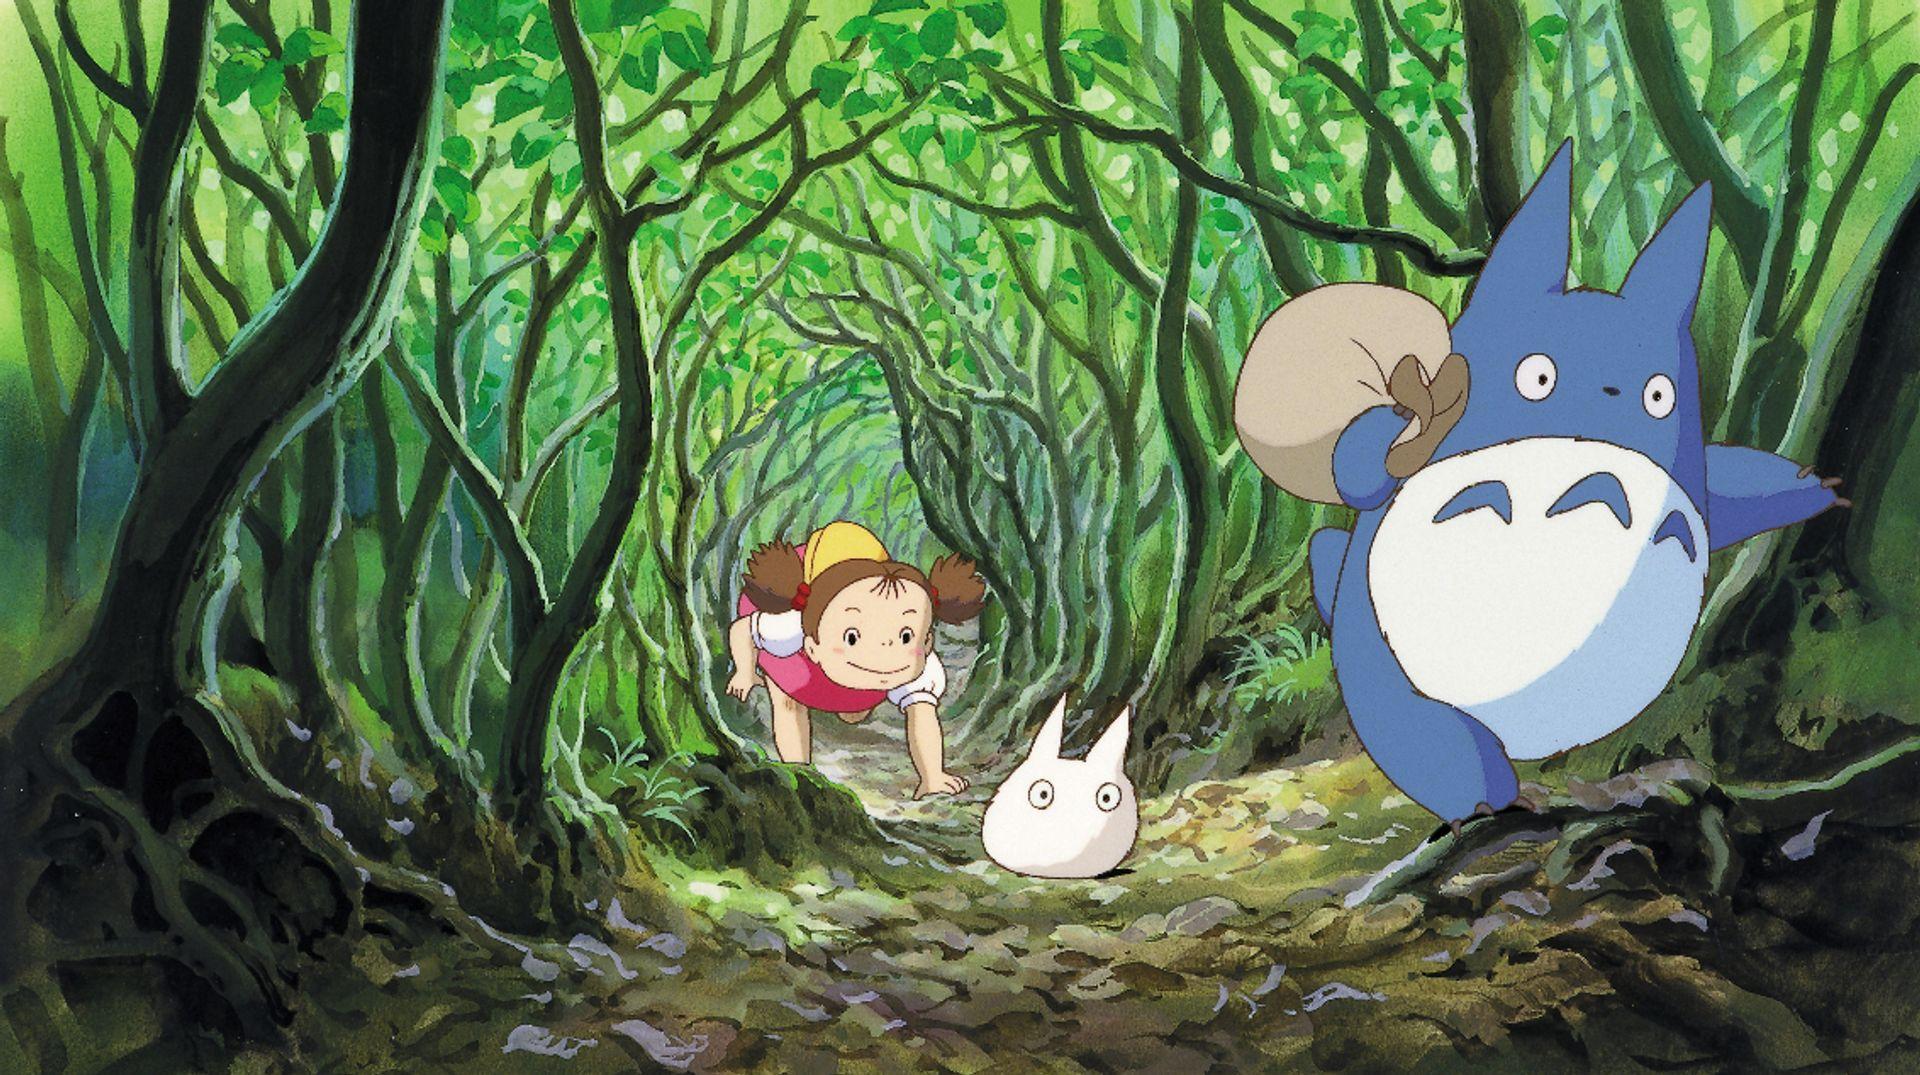 Film Still, My Neighbor Totaro (1988), by Hayao Miyazaki © 1988 Studio Ghibli